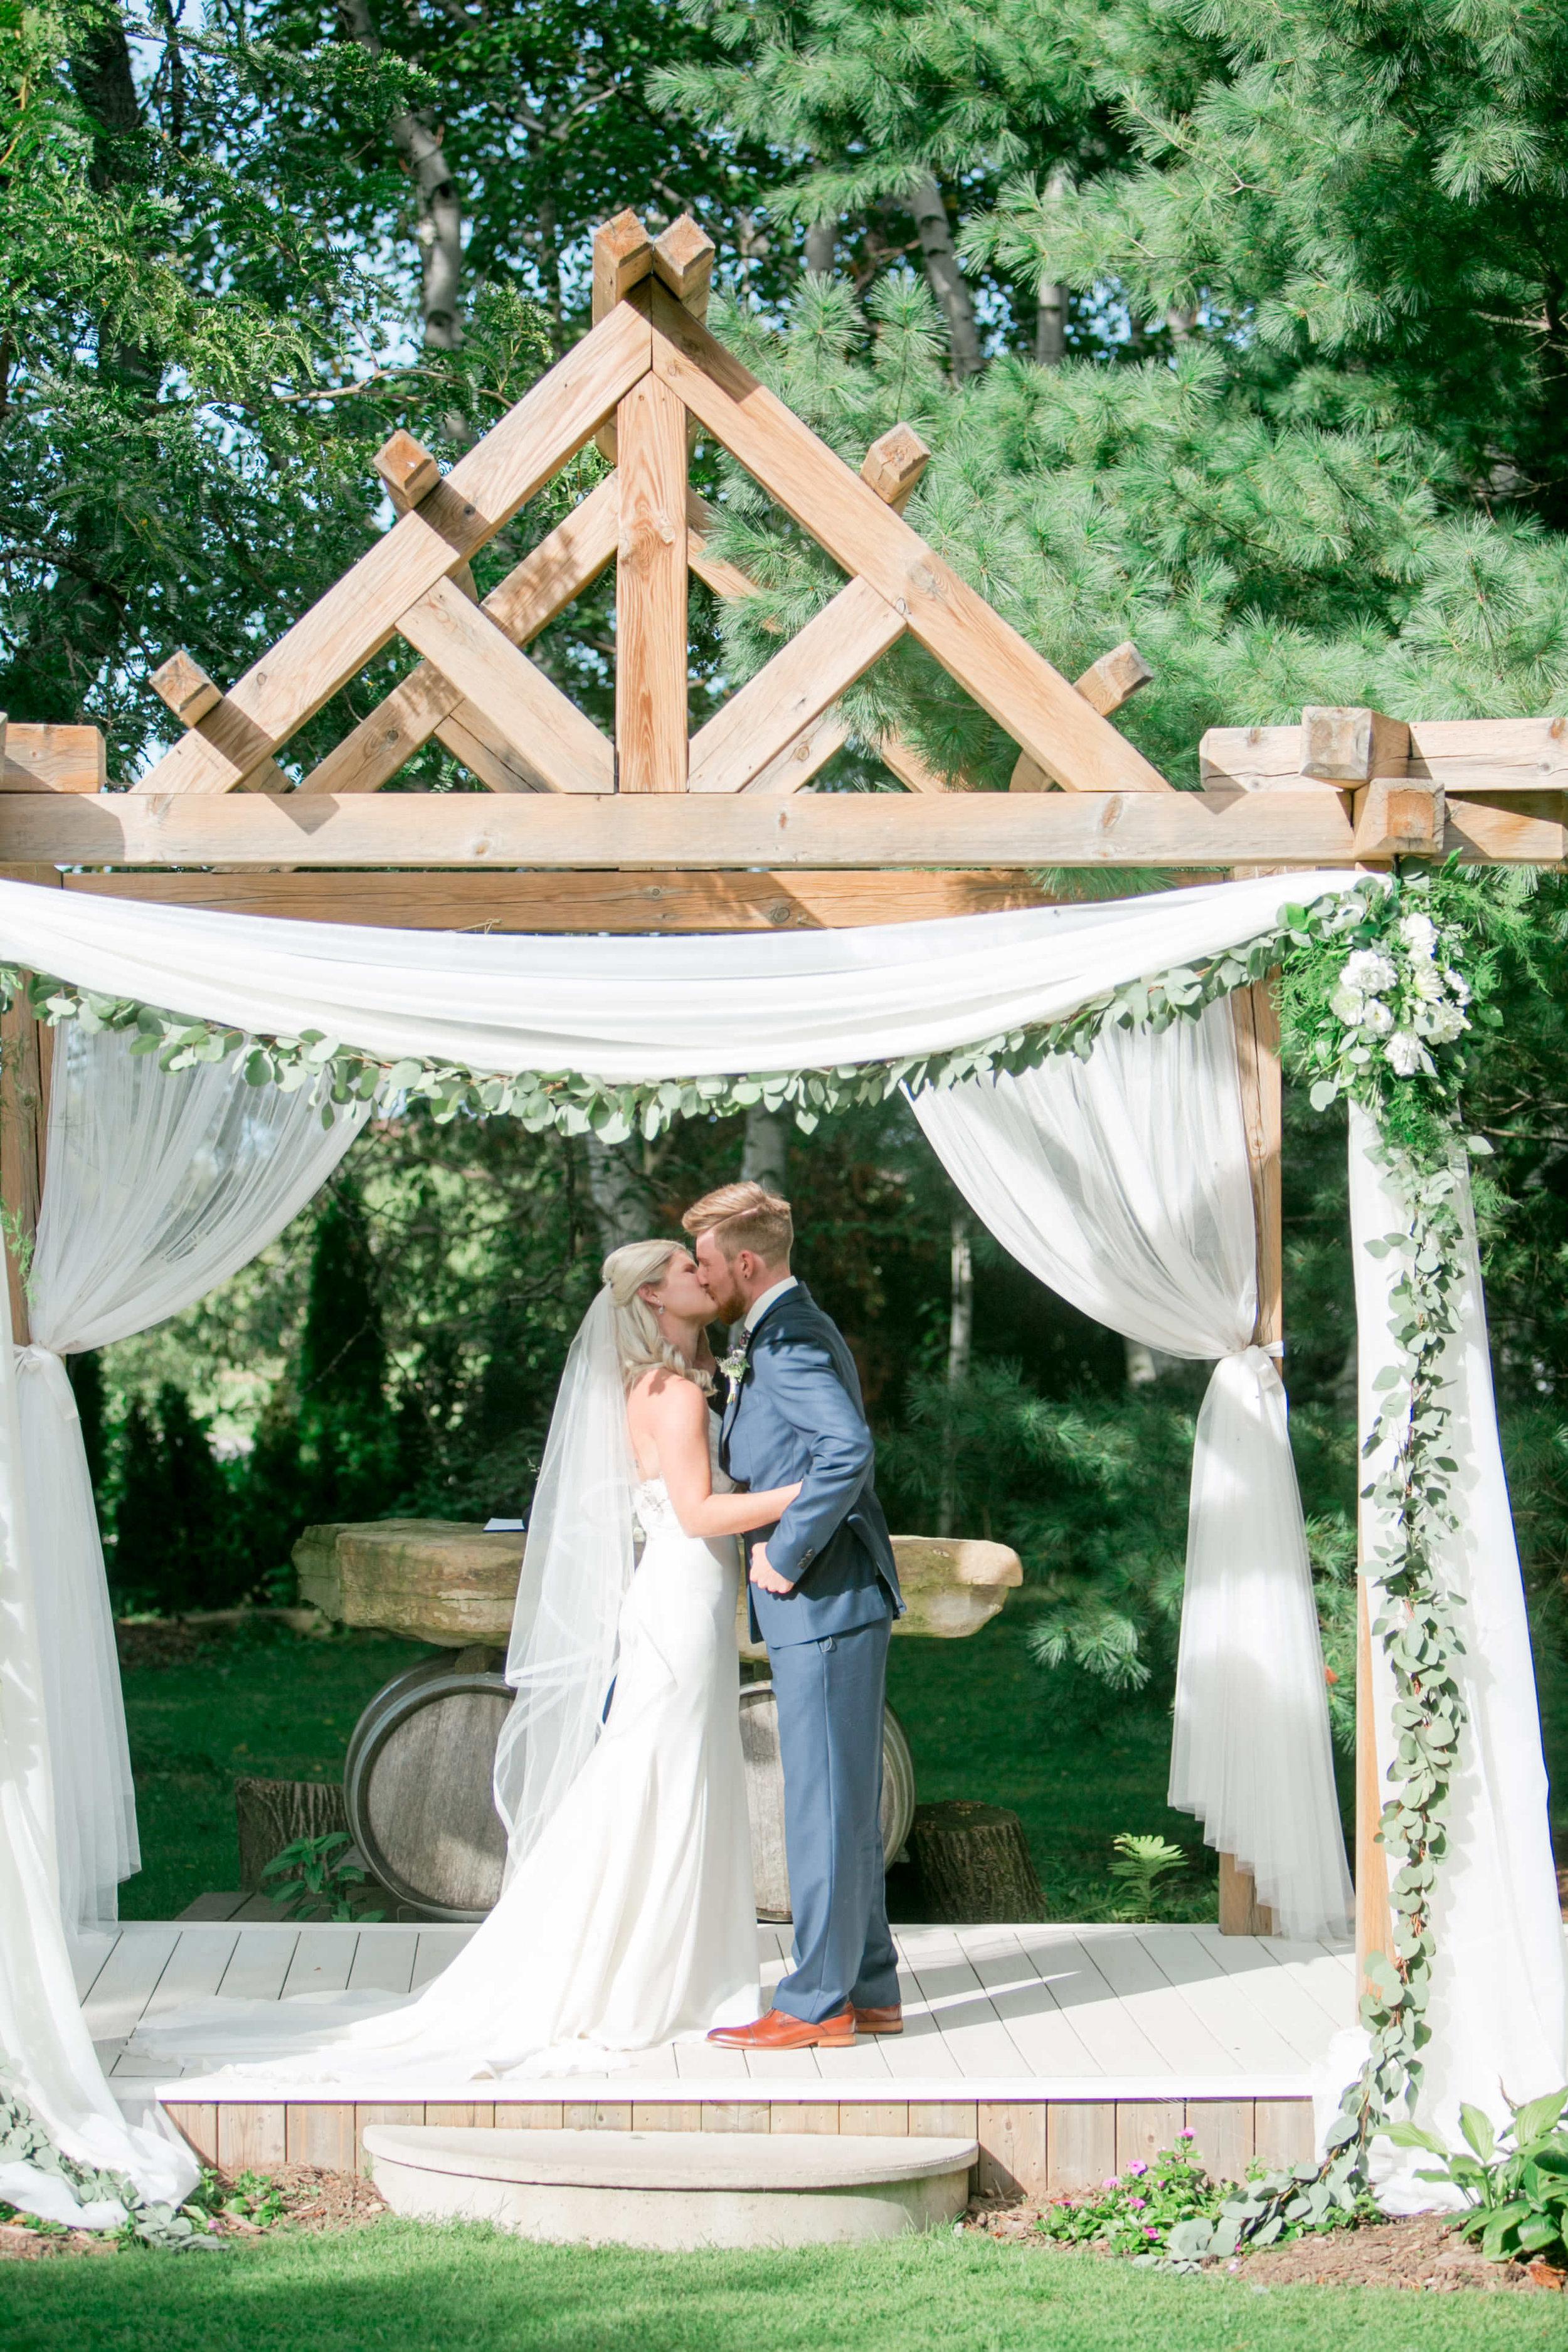 Maddy___Brandon___Daniel_Ricci_Weddings_High_Res._Finals_307.jpg